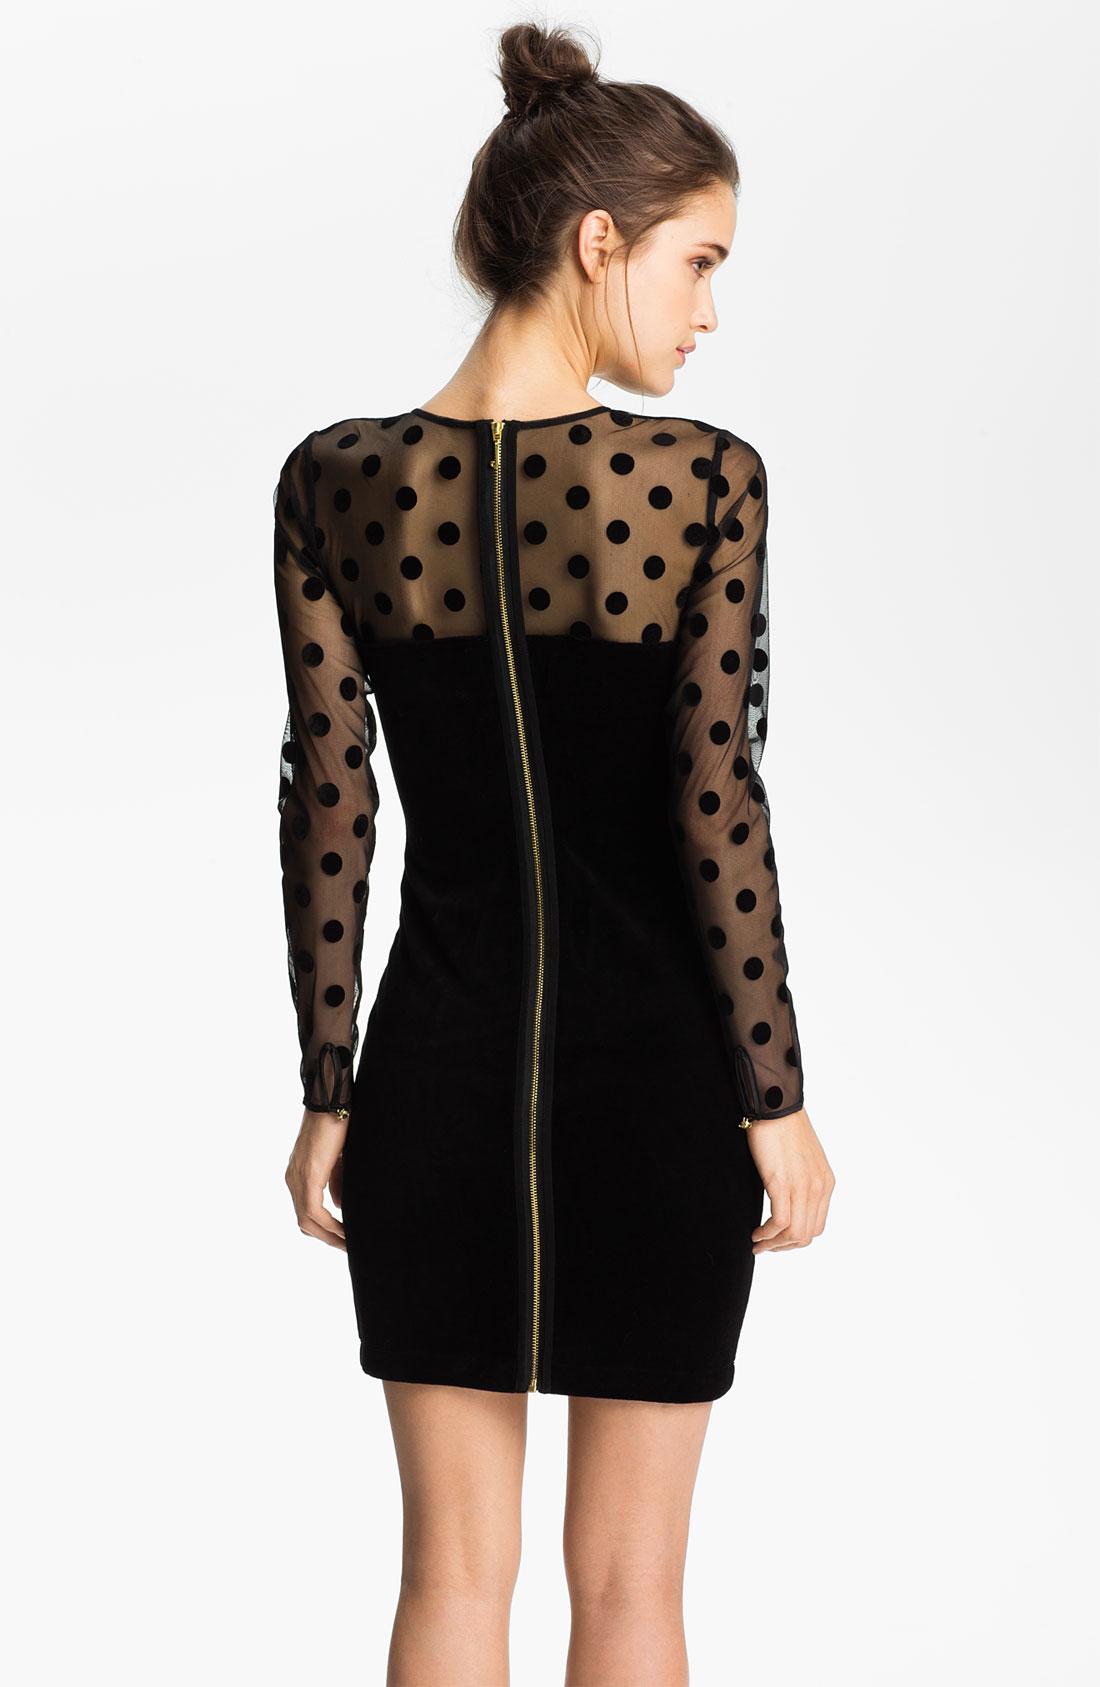 Juicy couture Sheer Polka Dot Velvet Dress in Black